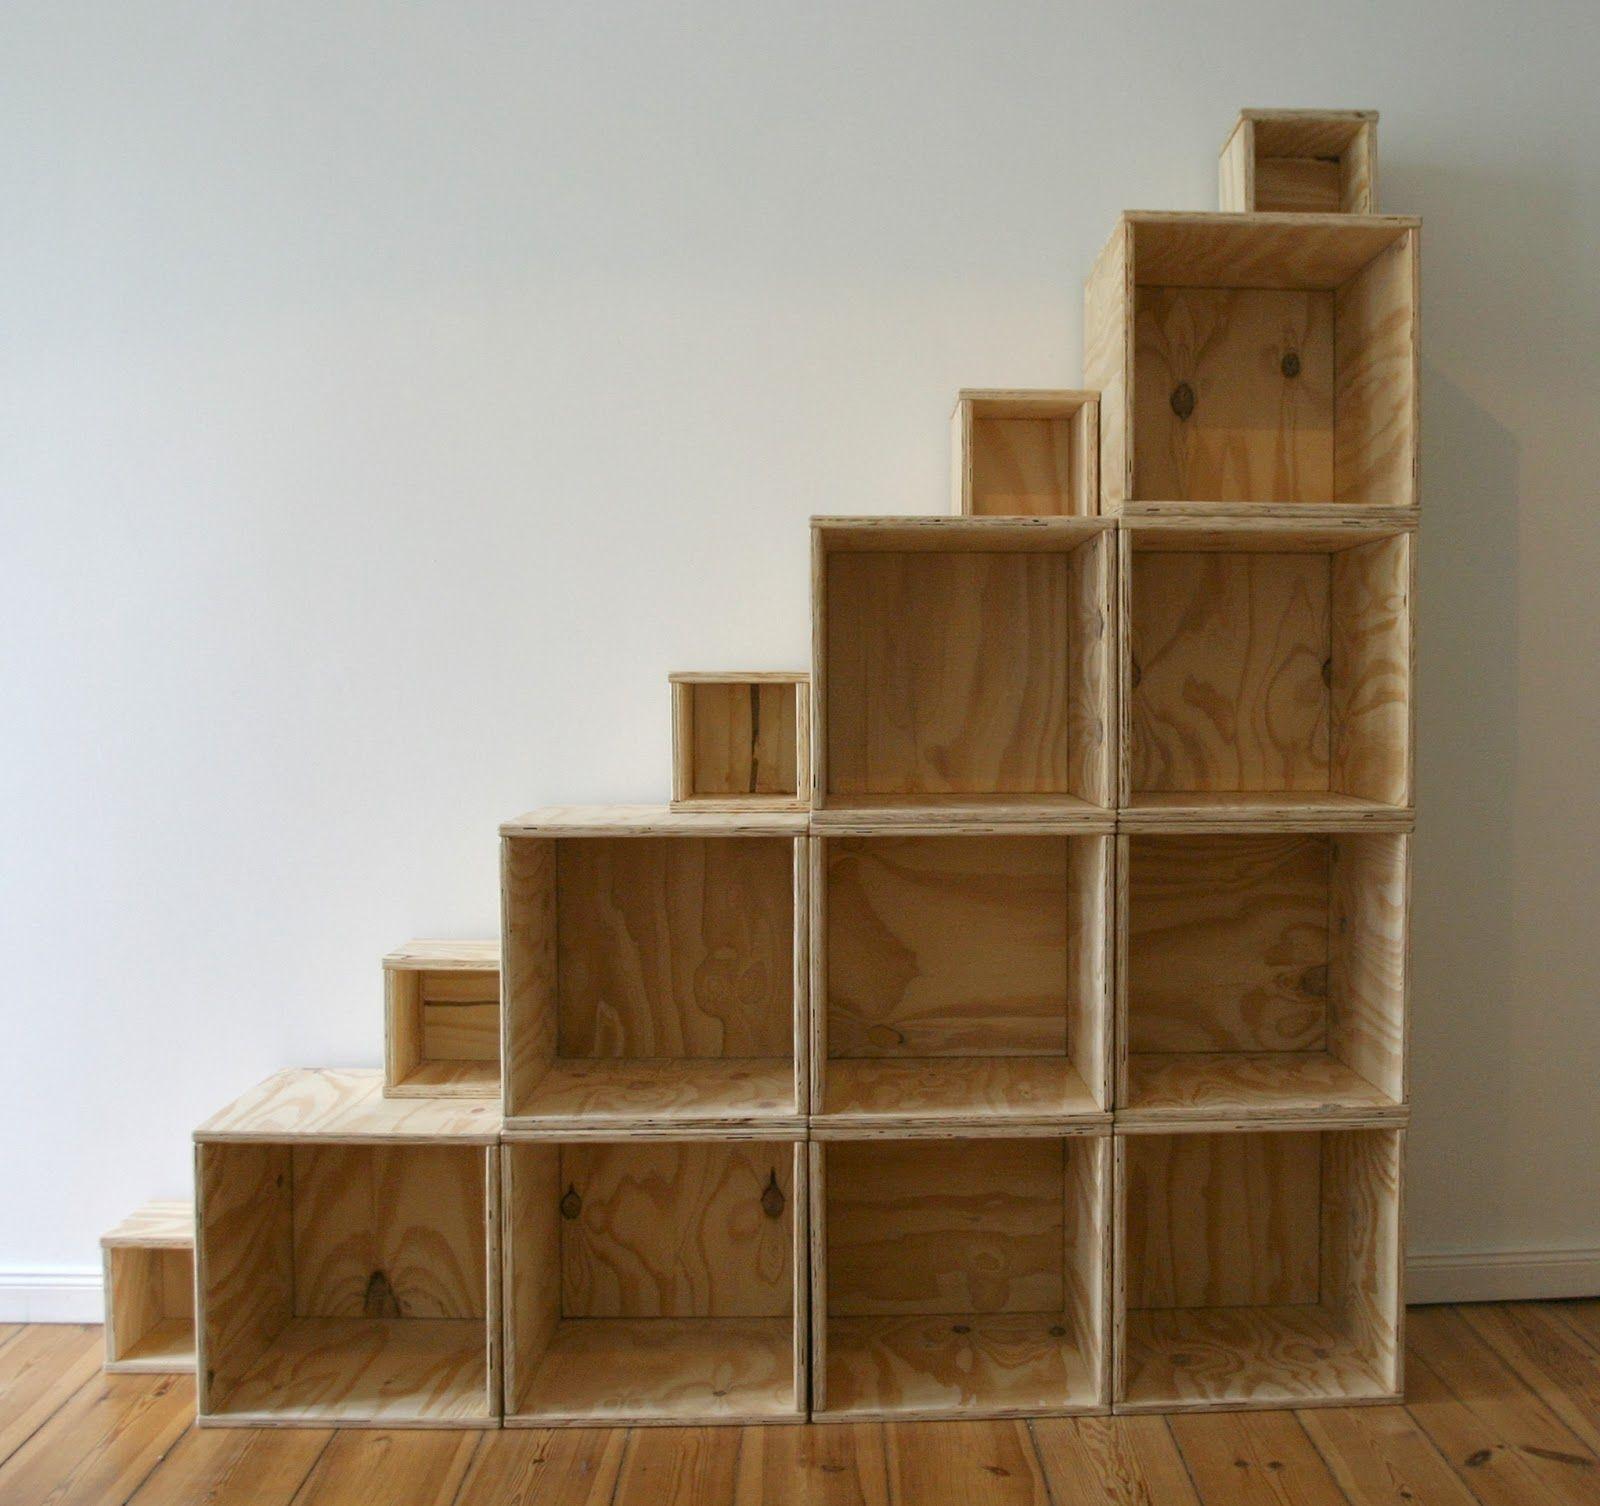 hochebene selber bauen wo88 hitoiro. Black Bedroom Furniture Sets. Home Design Ideas